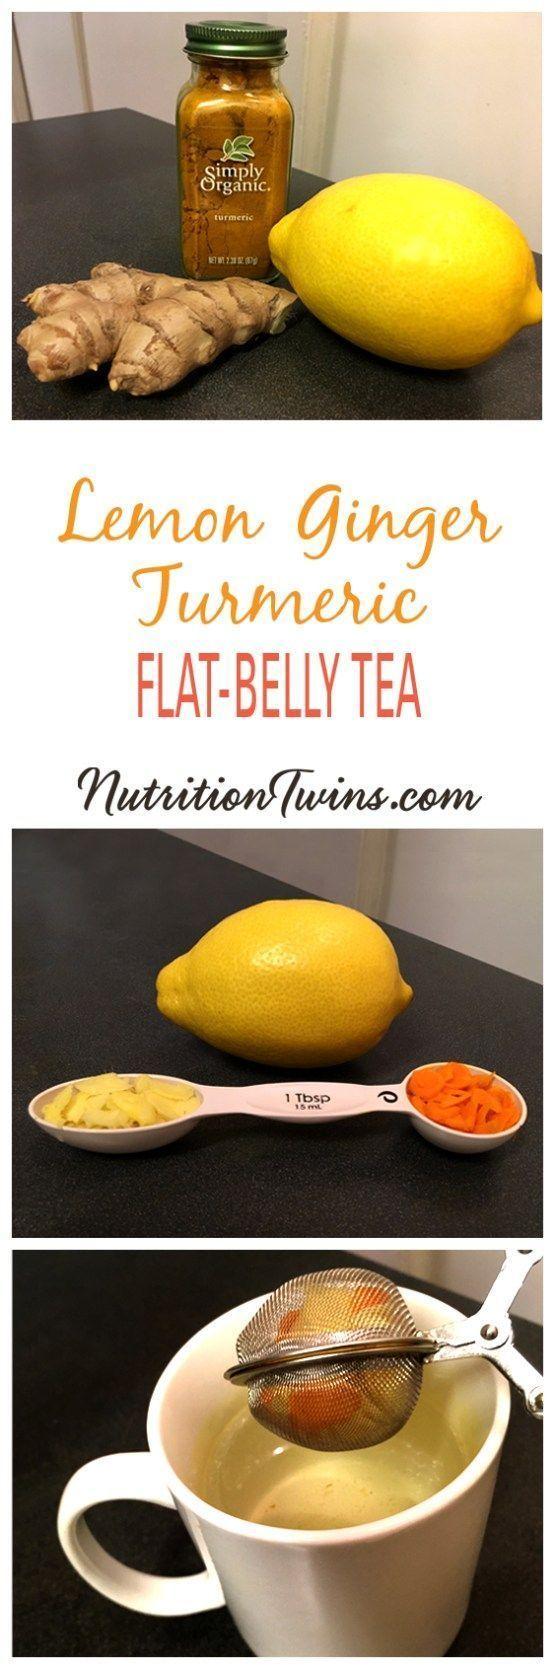 "Lemon Ginger Turmeric ""Detox"" Tea | Nutrition Twins    ¿Qué es la dieta Pa...,  #detox #dieta #DietaPaleoparabajardepeso #Ginger #Lemon #Nutrition #Qué #Tea #Turmeric #Twins"